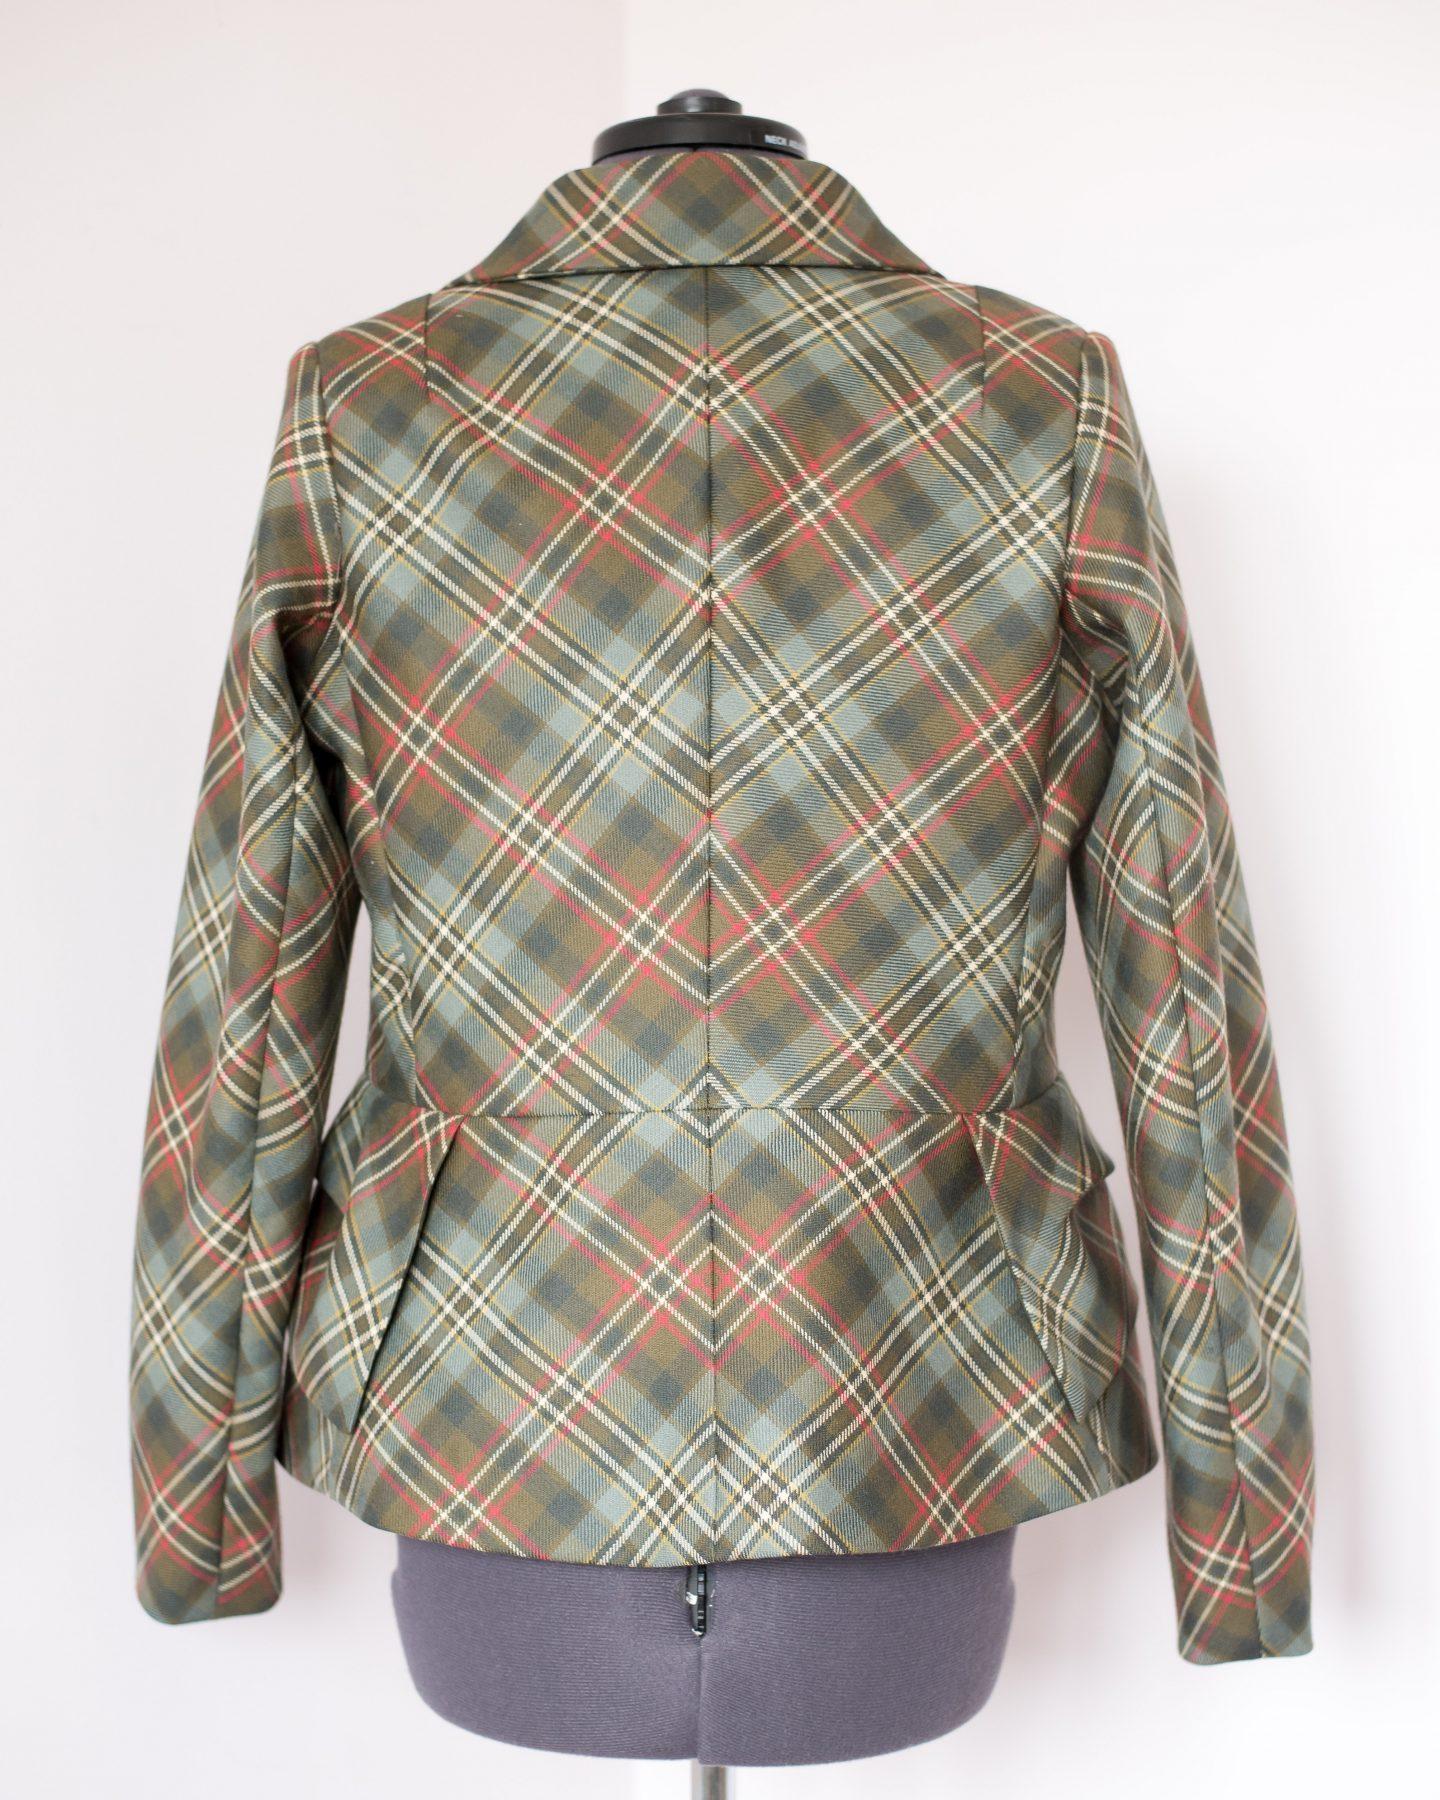 Tailored jacket part 2. Back view pattern matching.